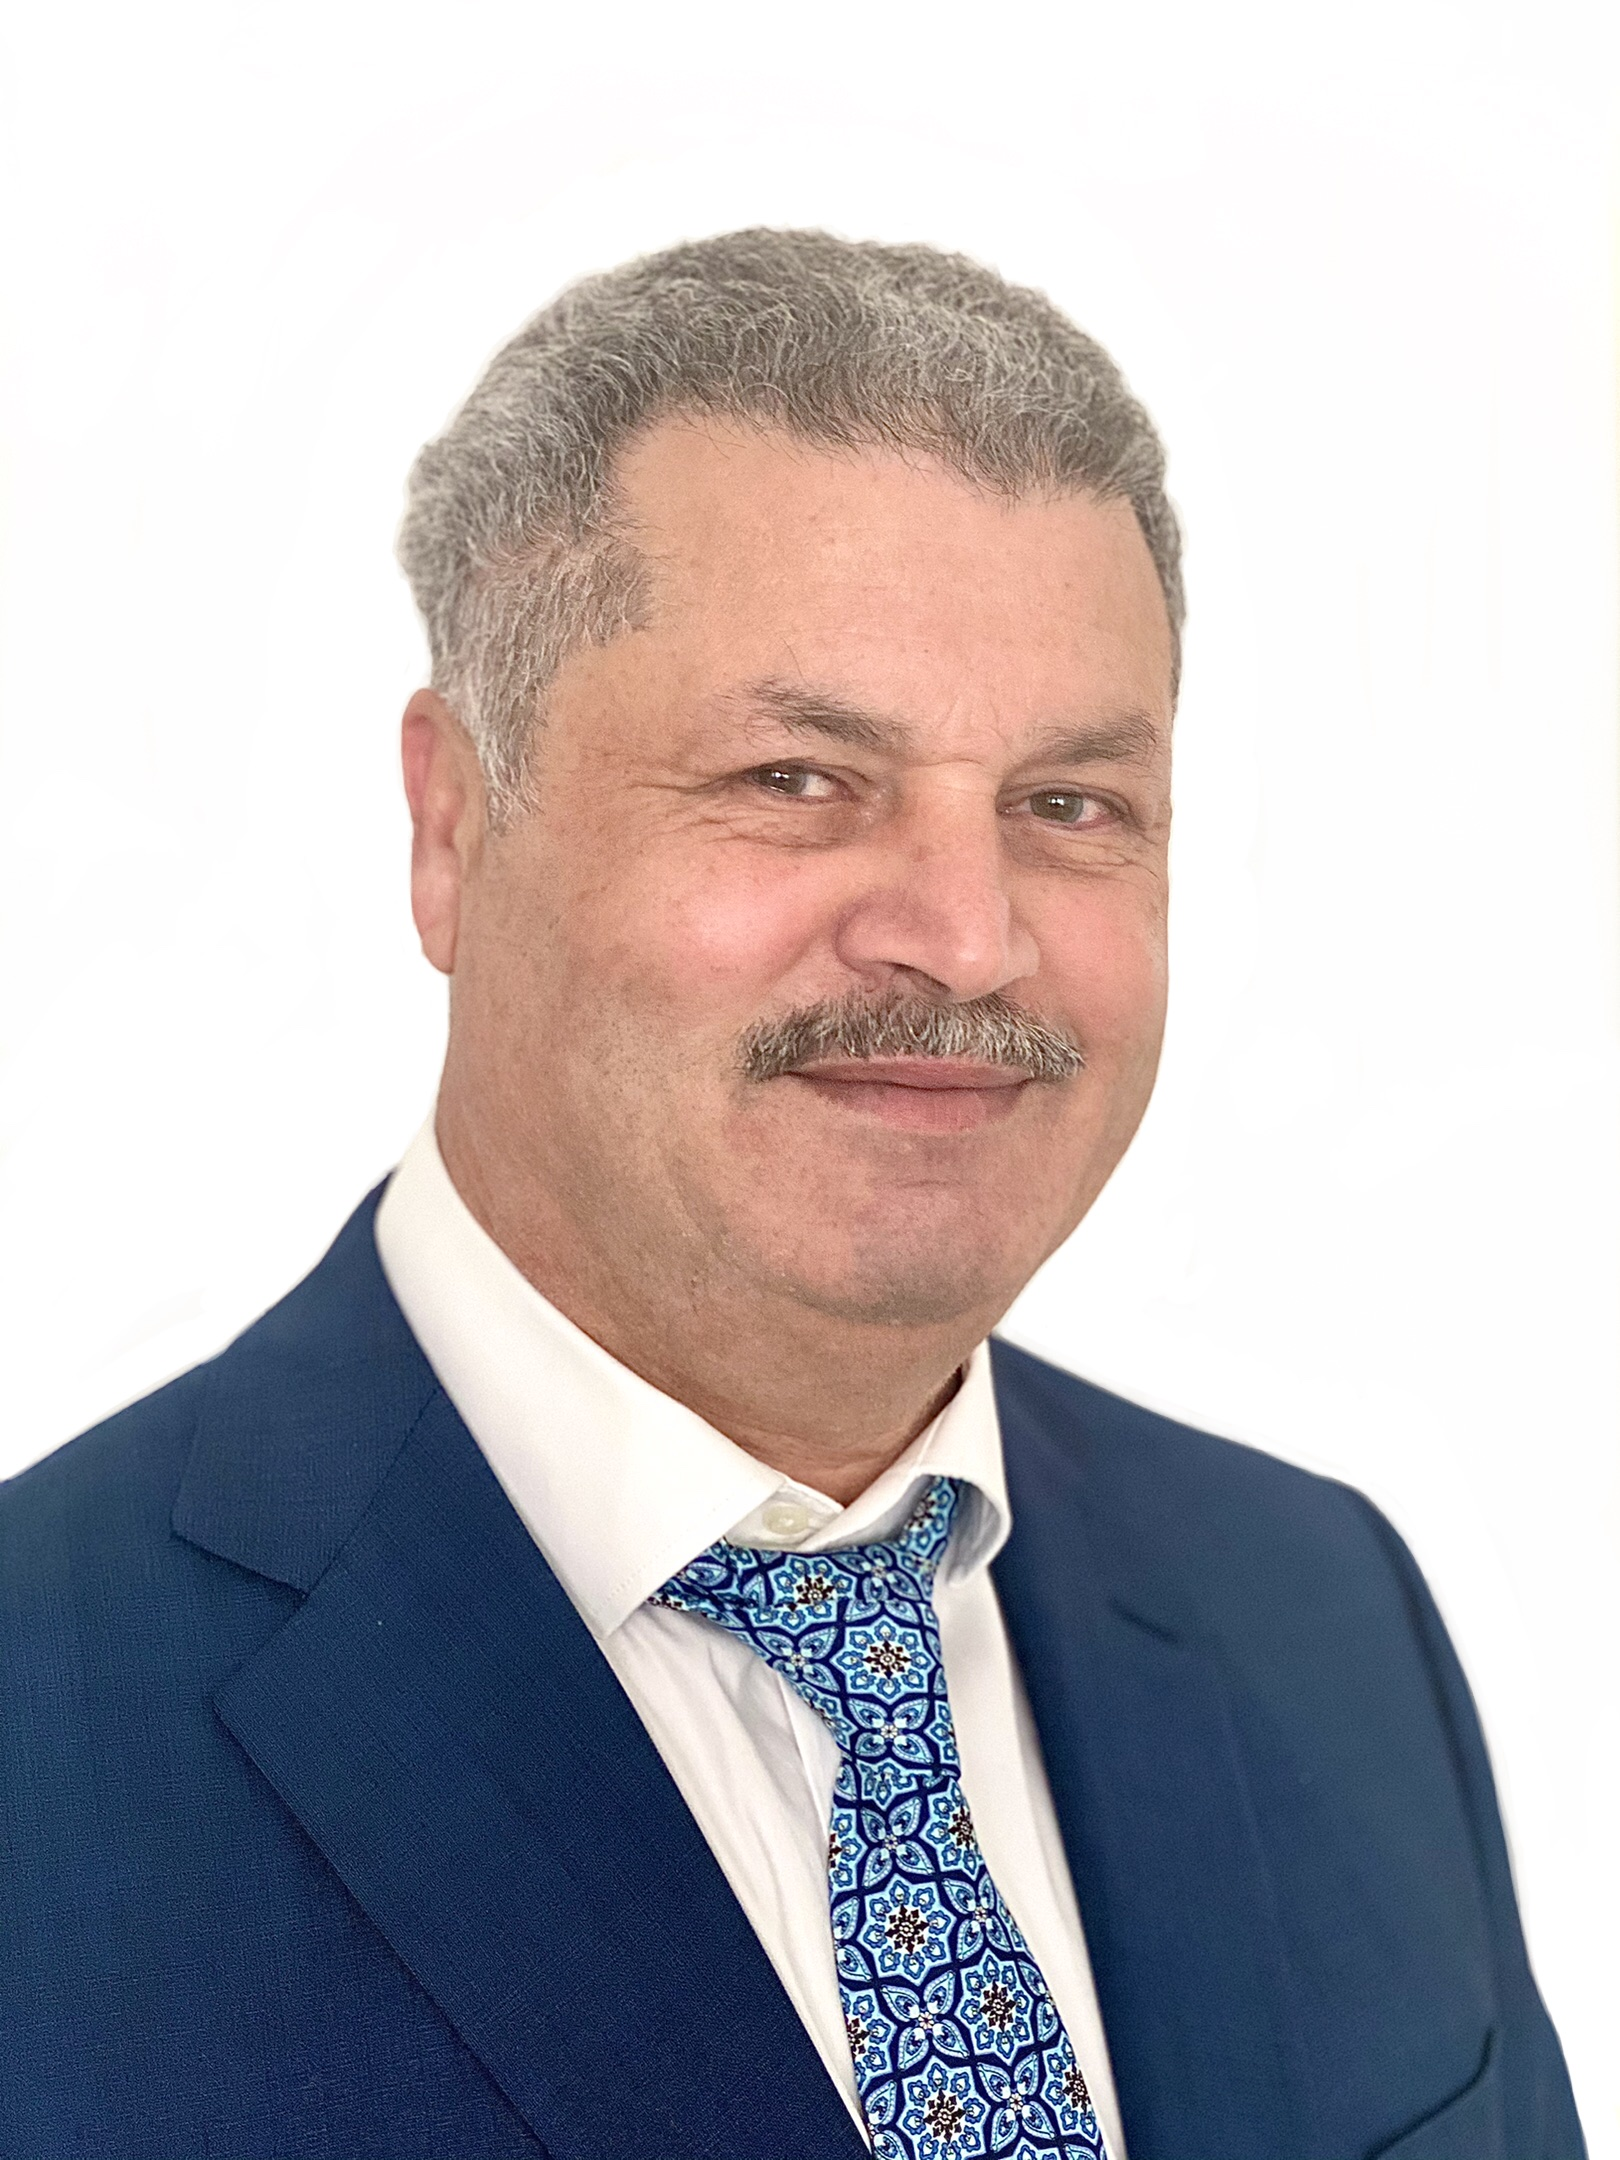 Dr. Mokhtar Kirane